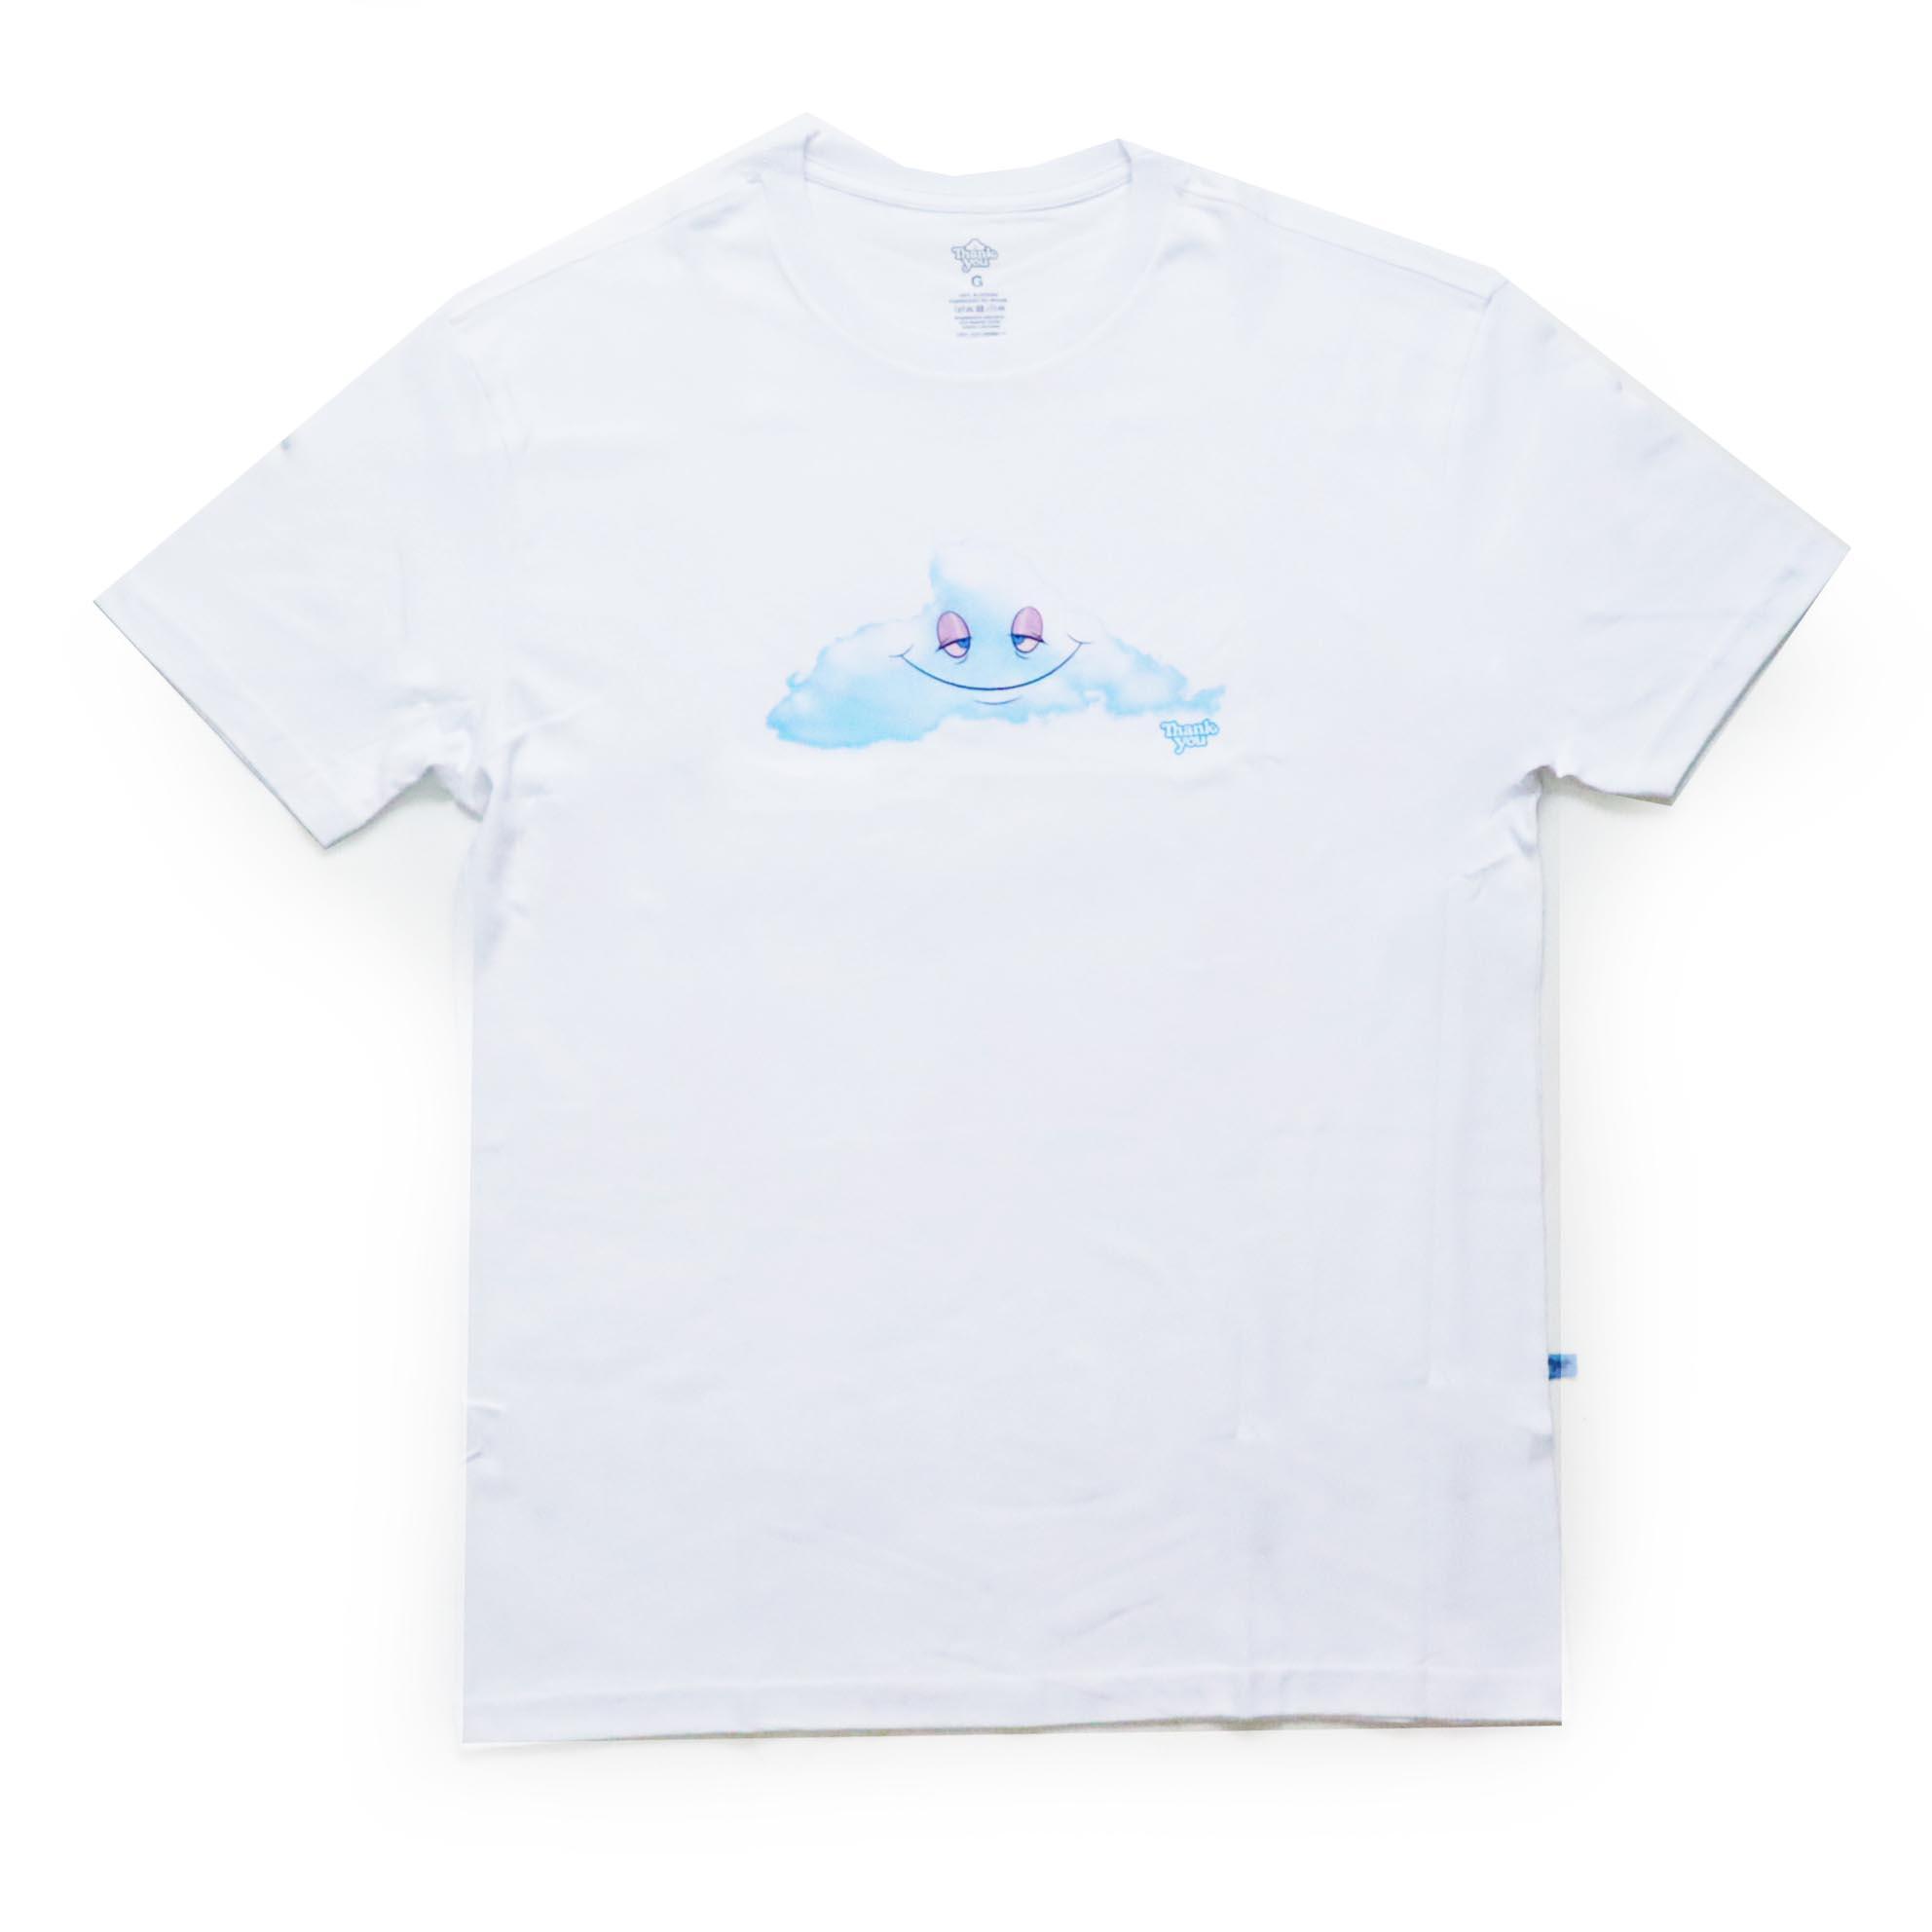 Camiseta Thank You Head In The Cloud - Branco